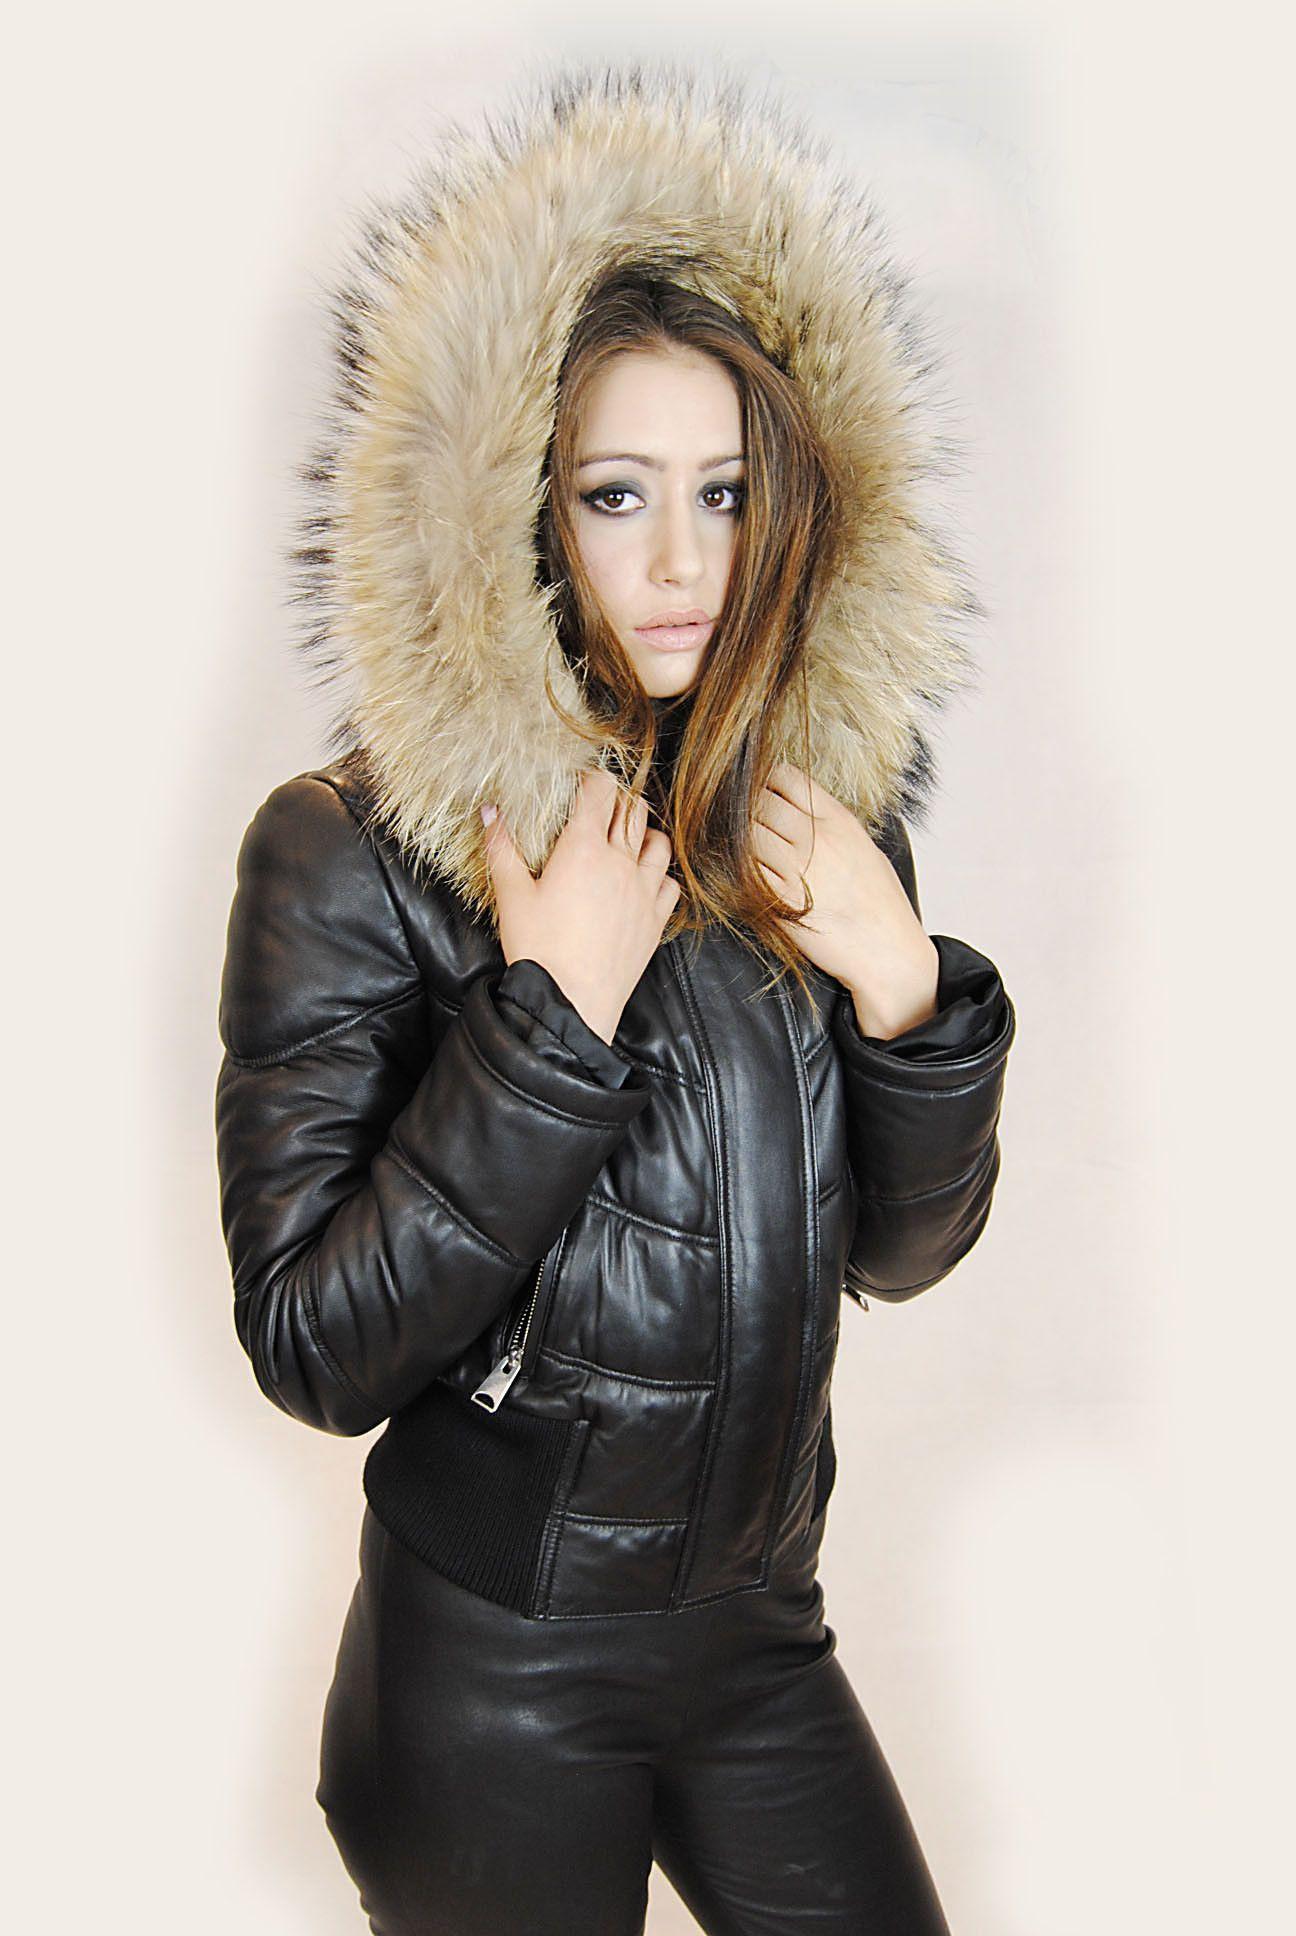 Jessimara Black Leather Puffer Bomber Coat With Raccoon Fur Trim Leather Hoodie Bomber Coat Denim Fashion [ 1936 x 1296 Pixel ]